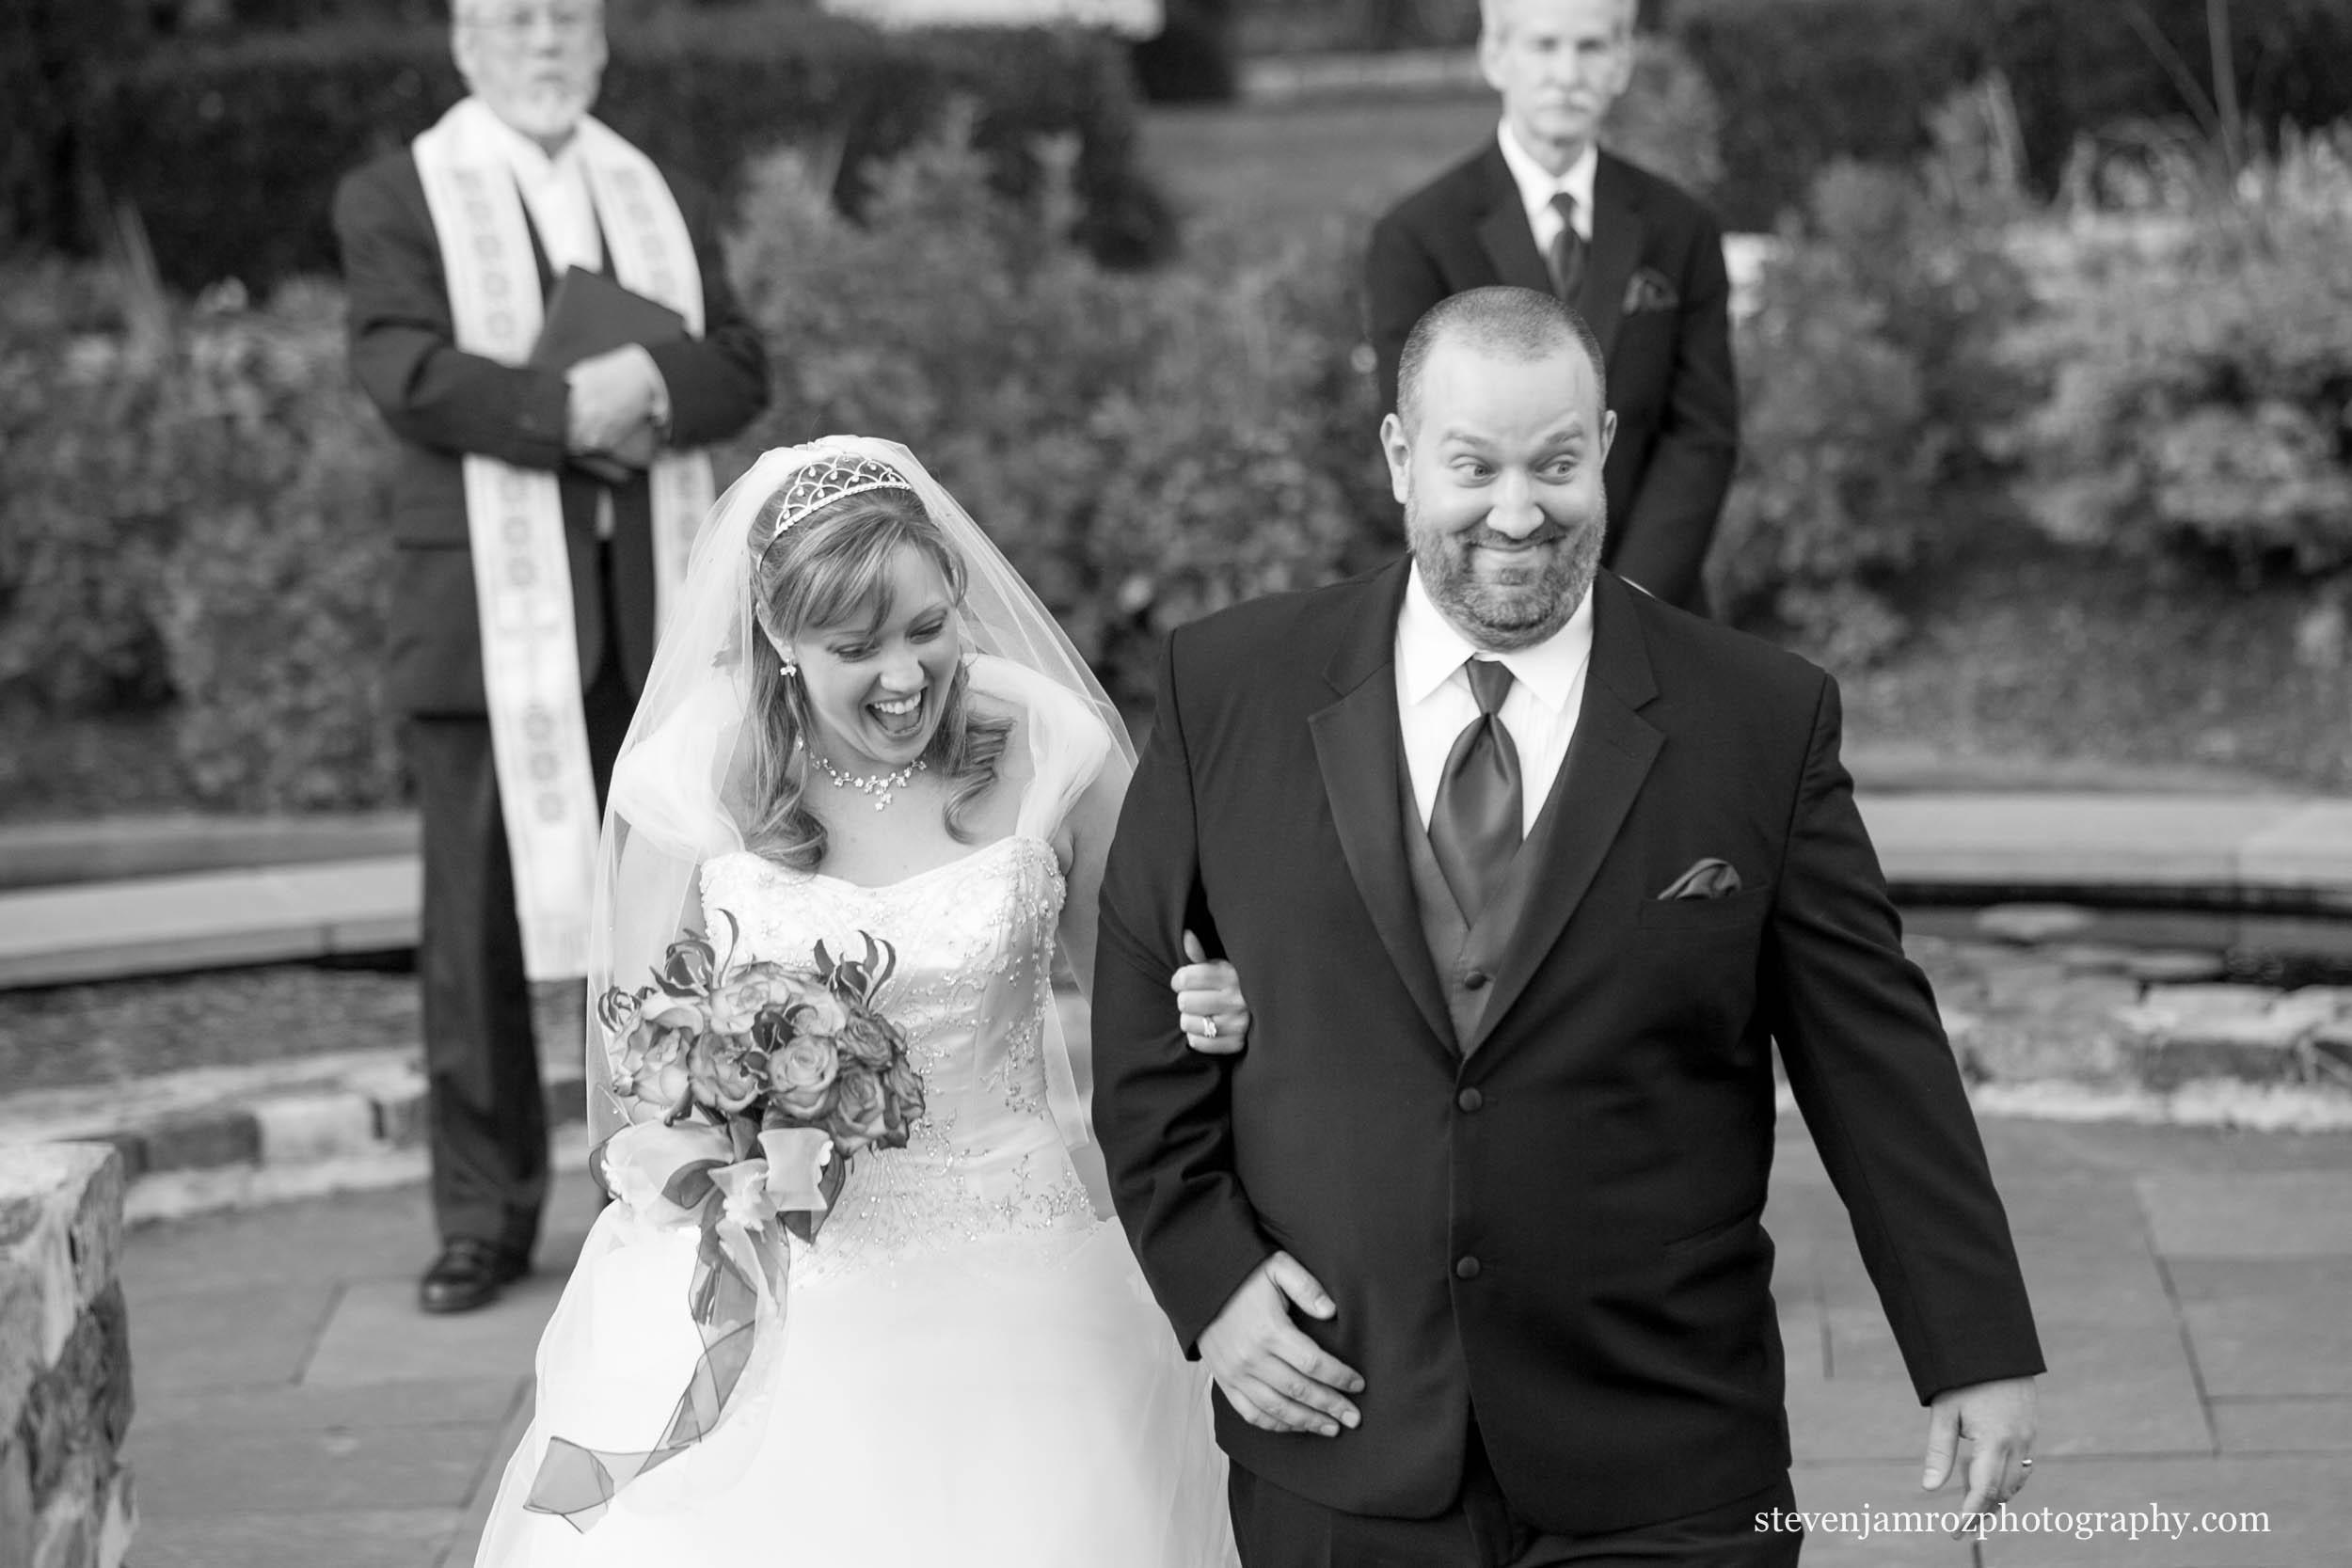 just-married-sarah-p-duke-gardens-photography-0965.jpg